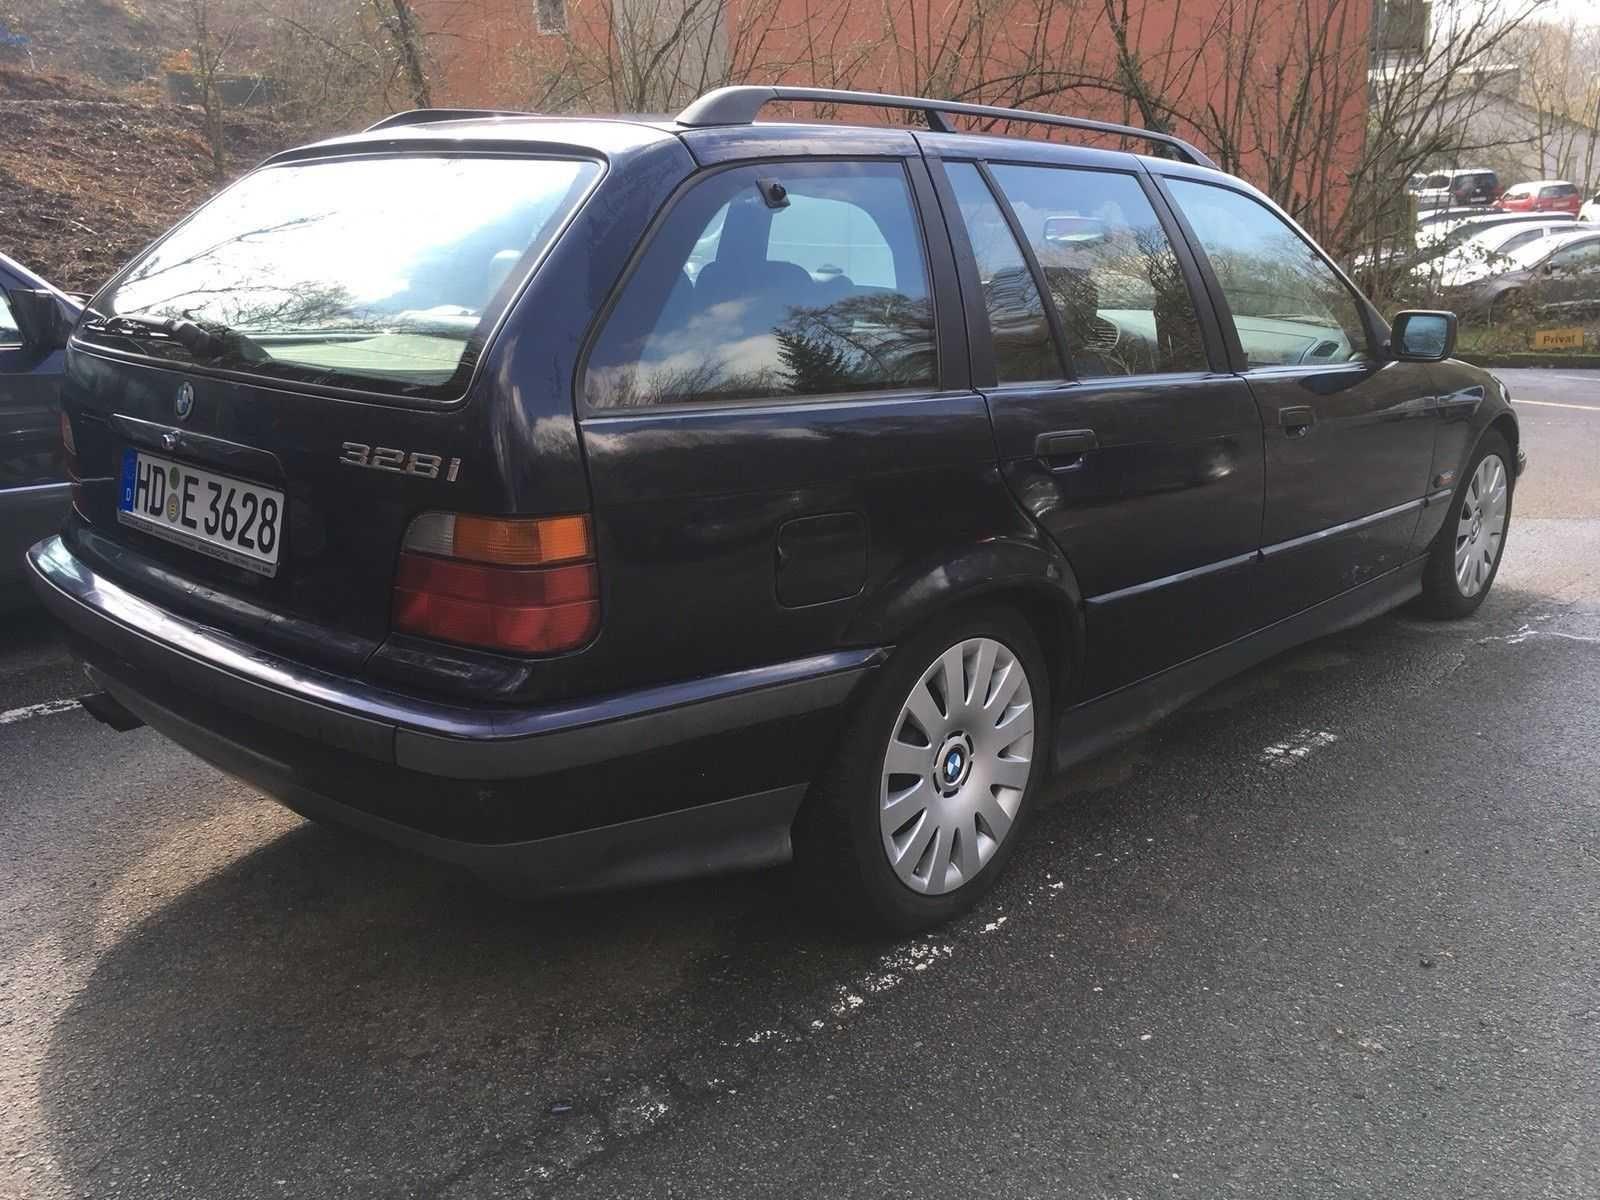 eBay.de - Mobiles günstiger - BMW E36 328i Touring, Schalter, TÜV ...